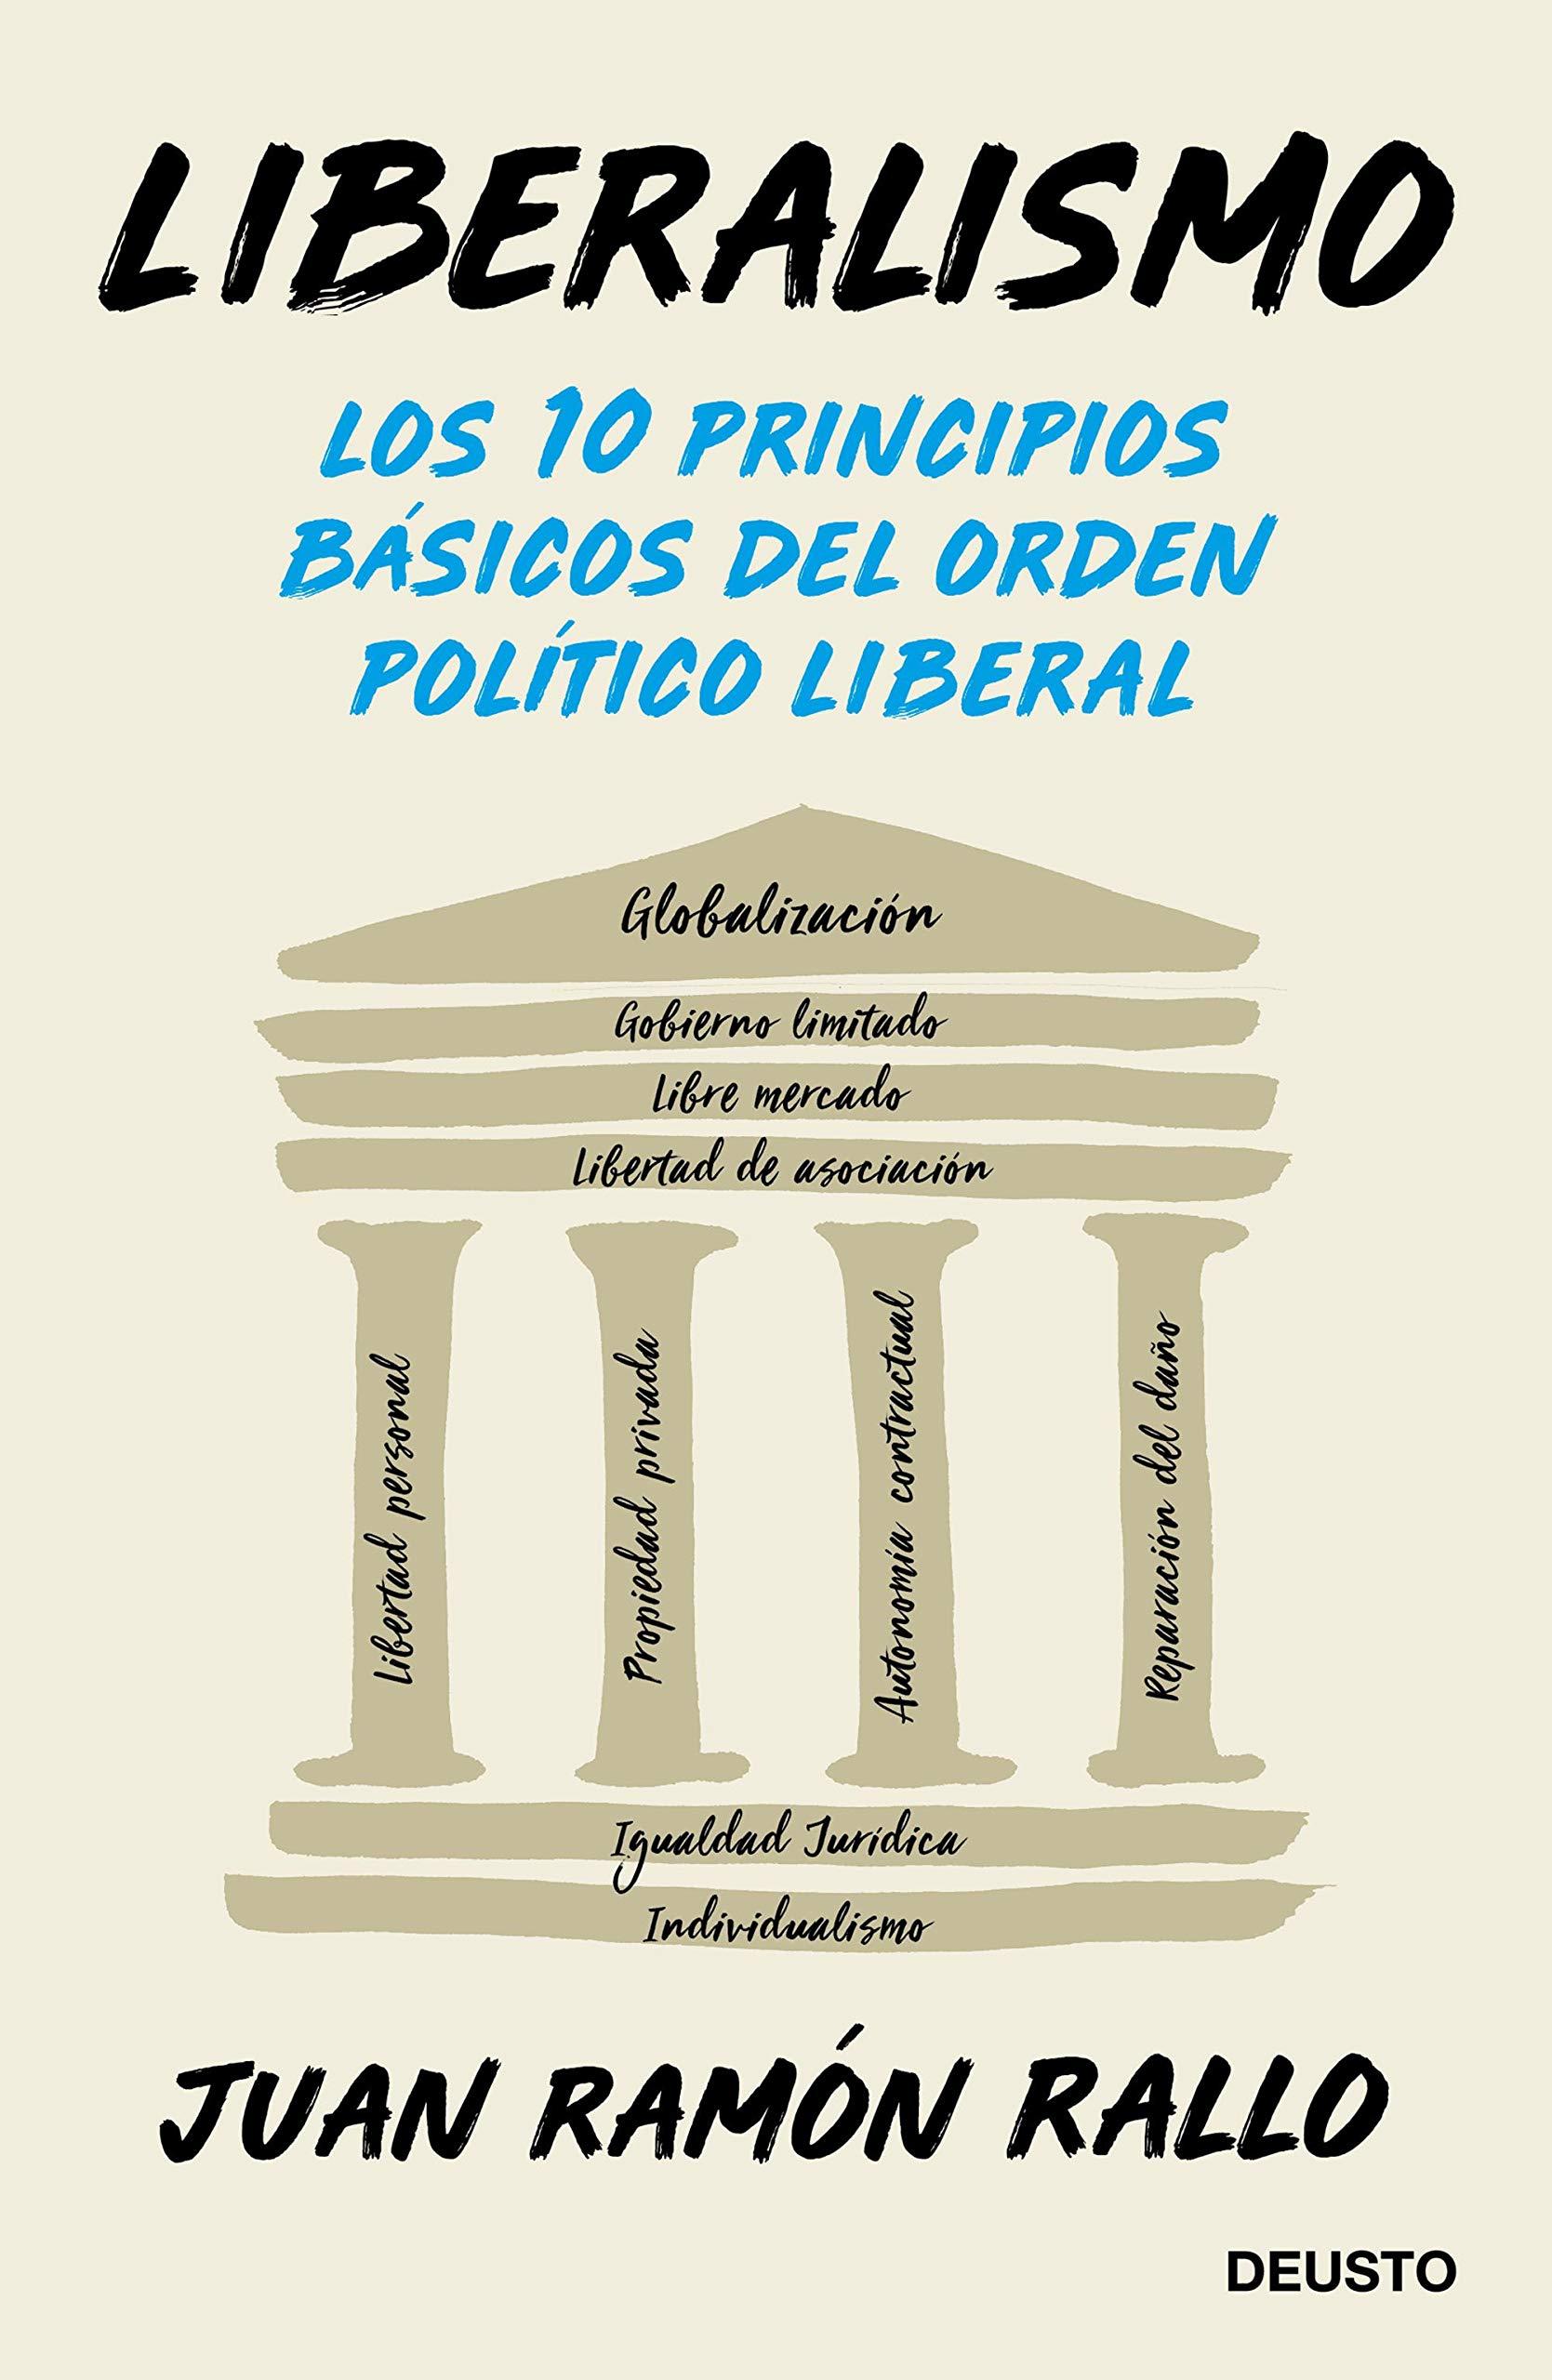 Liberalismo: Los 10 principios básicos del orden liberal (Sin colección) por Juan Ramón Rallo